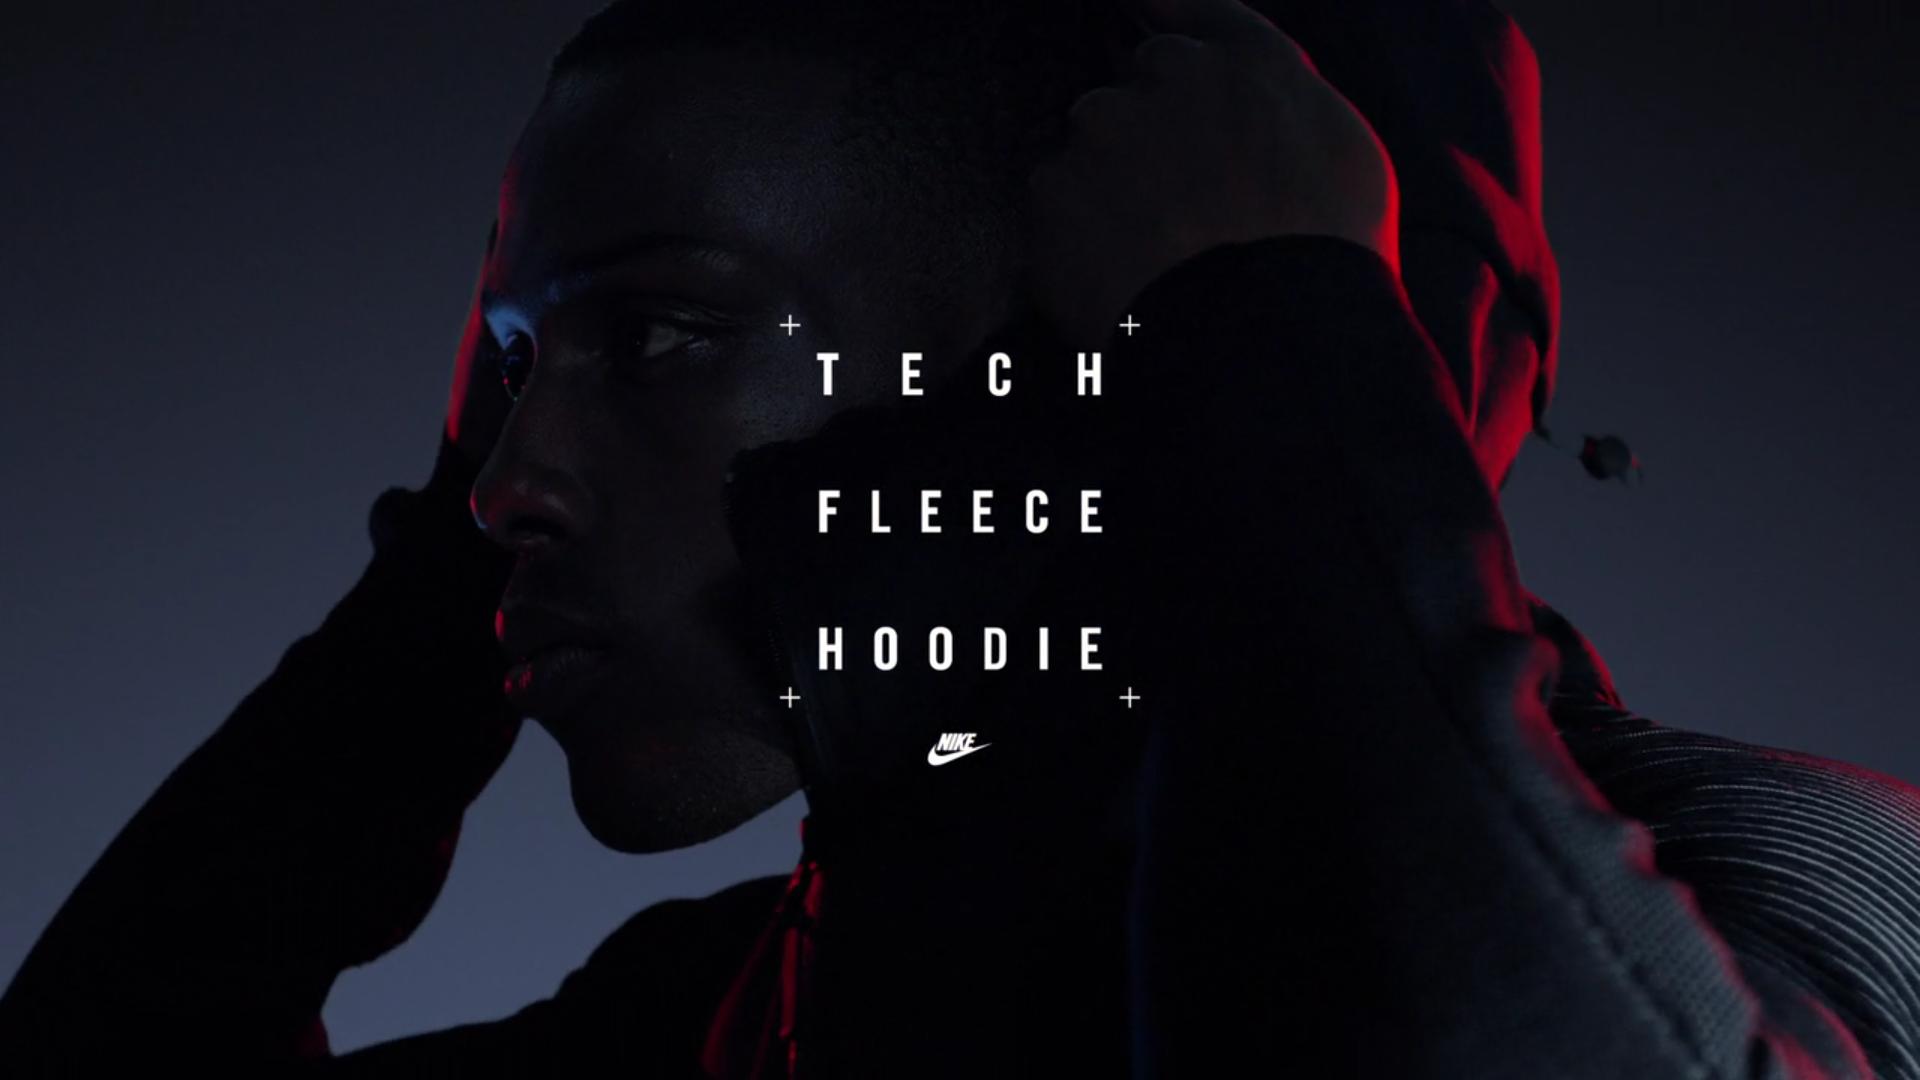 Nike Techfleelce